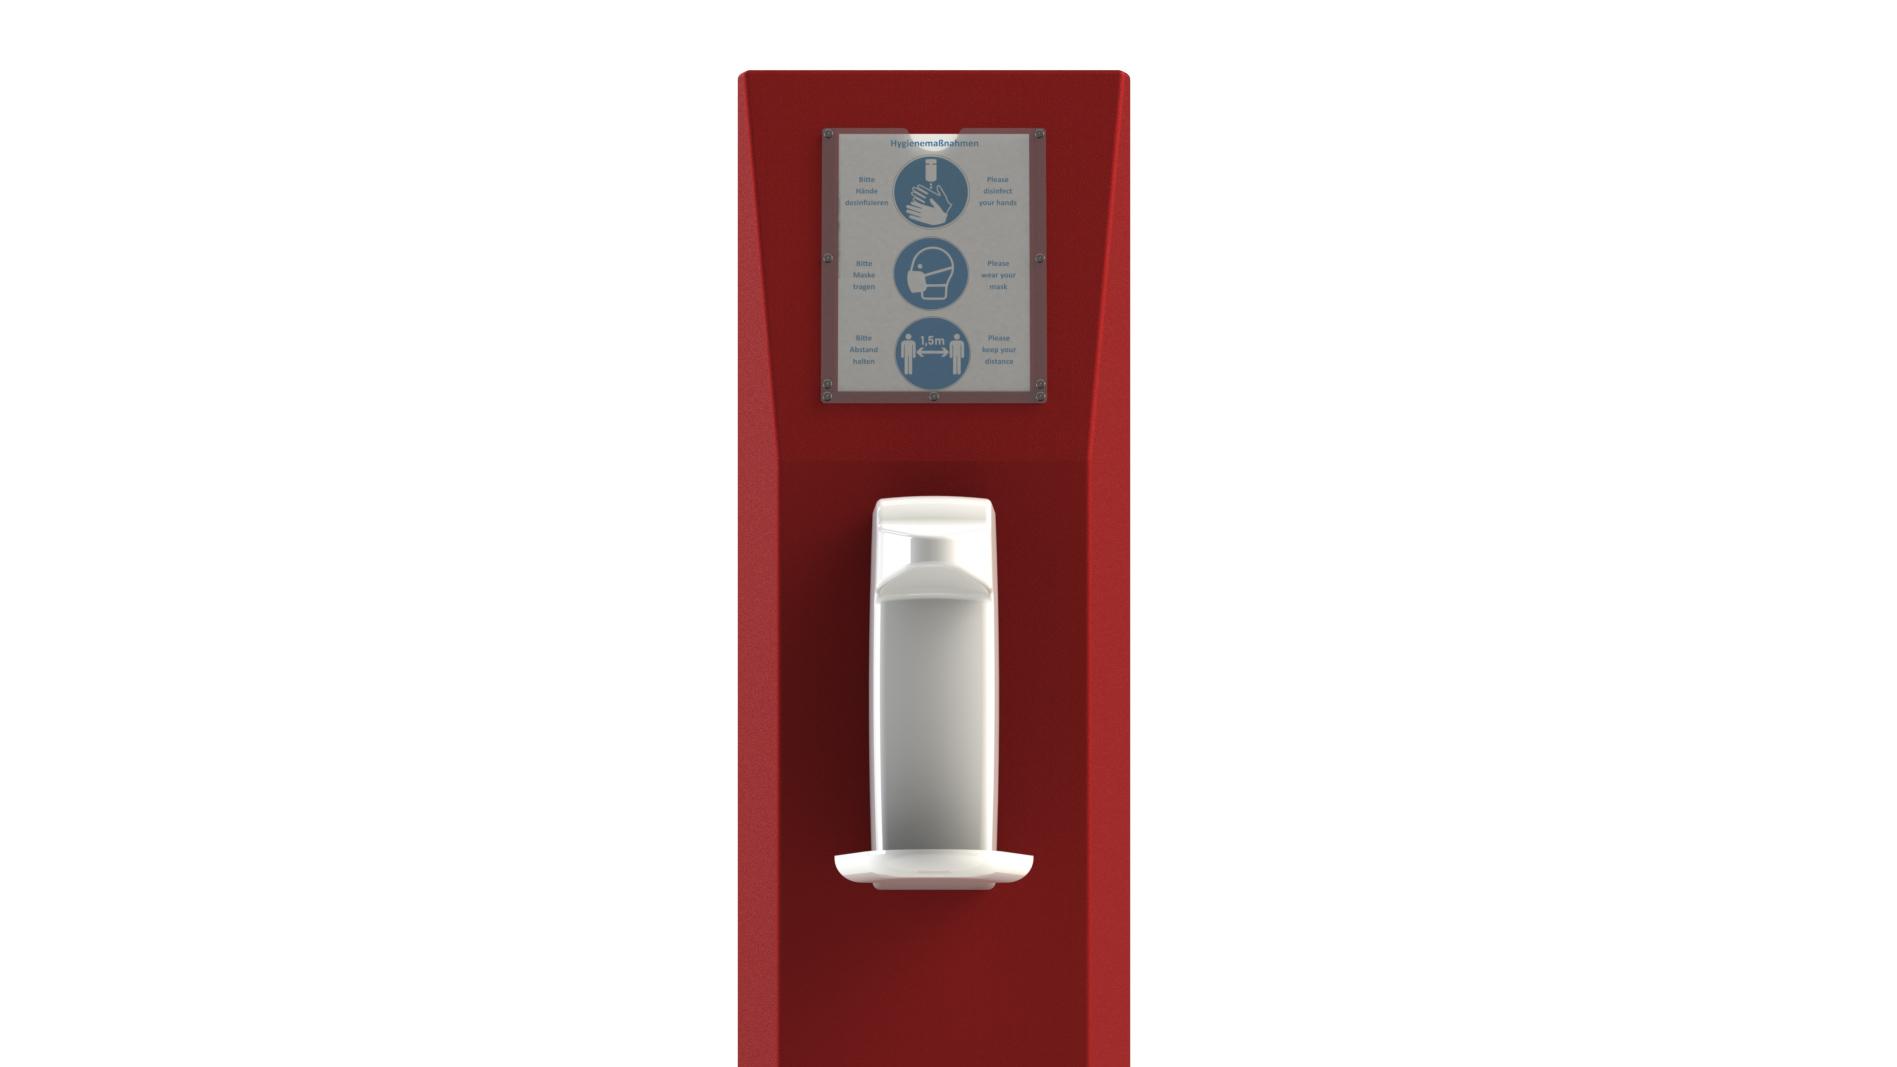 Hygienesaeule-Monolith-Trapez-Sensorspender-Infotafel